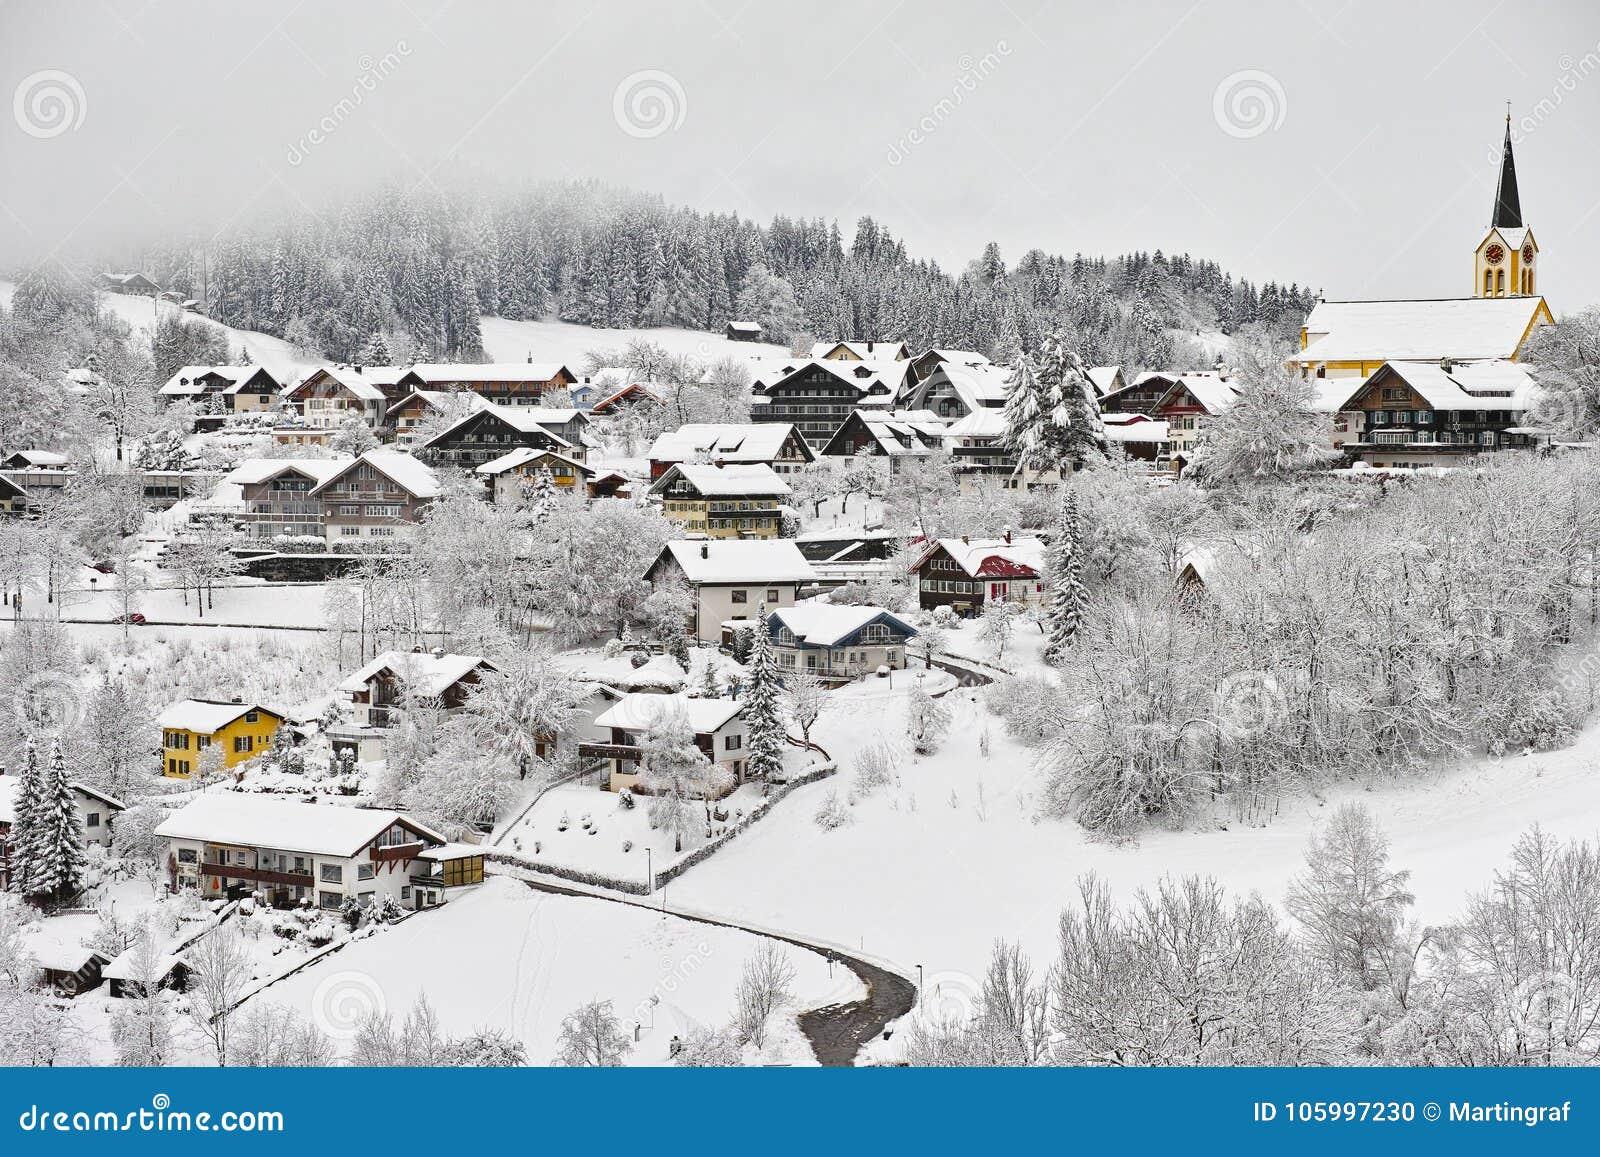 Snow-covered romantic German town landscape